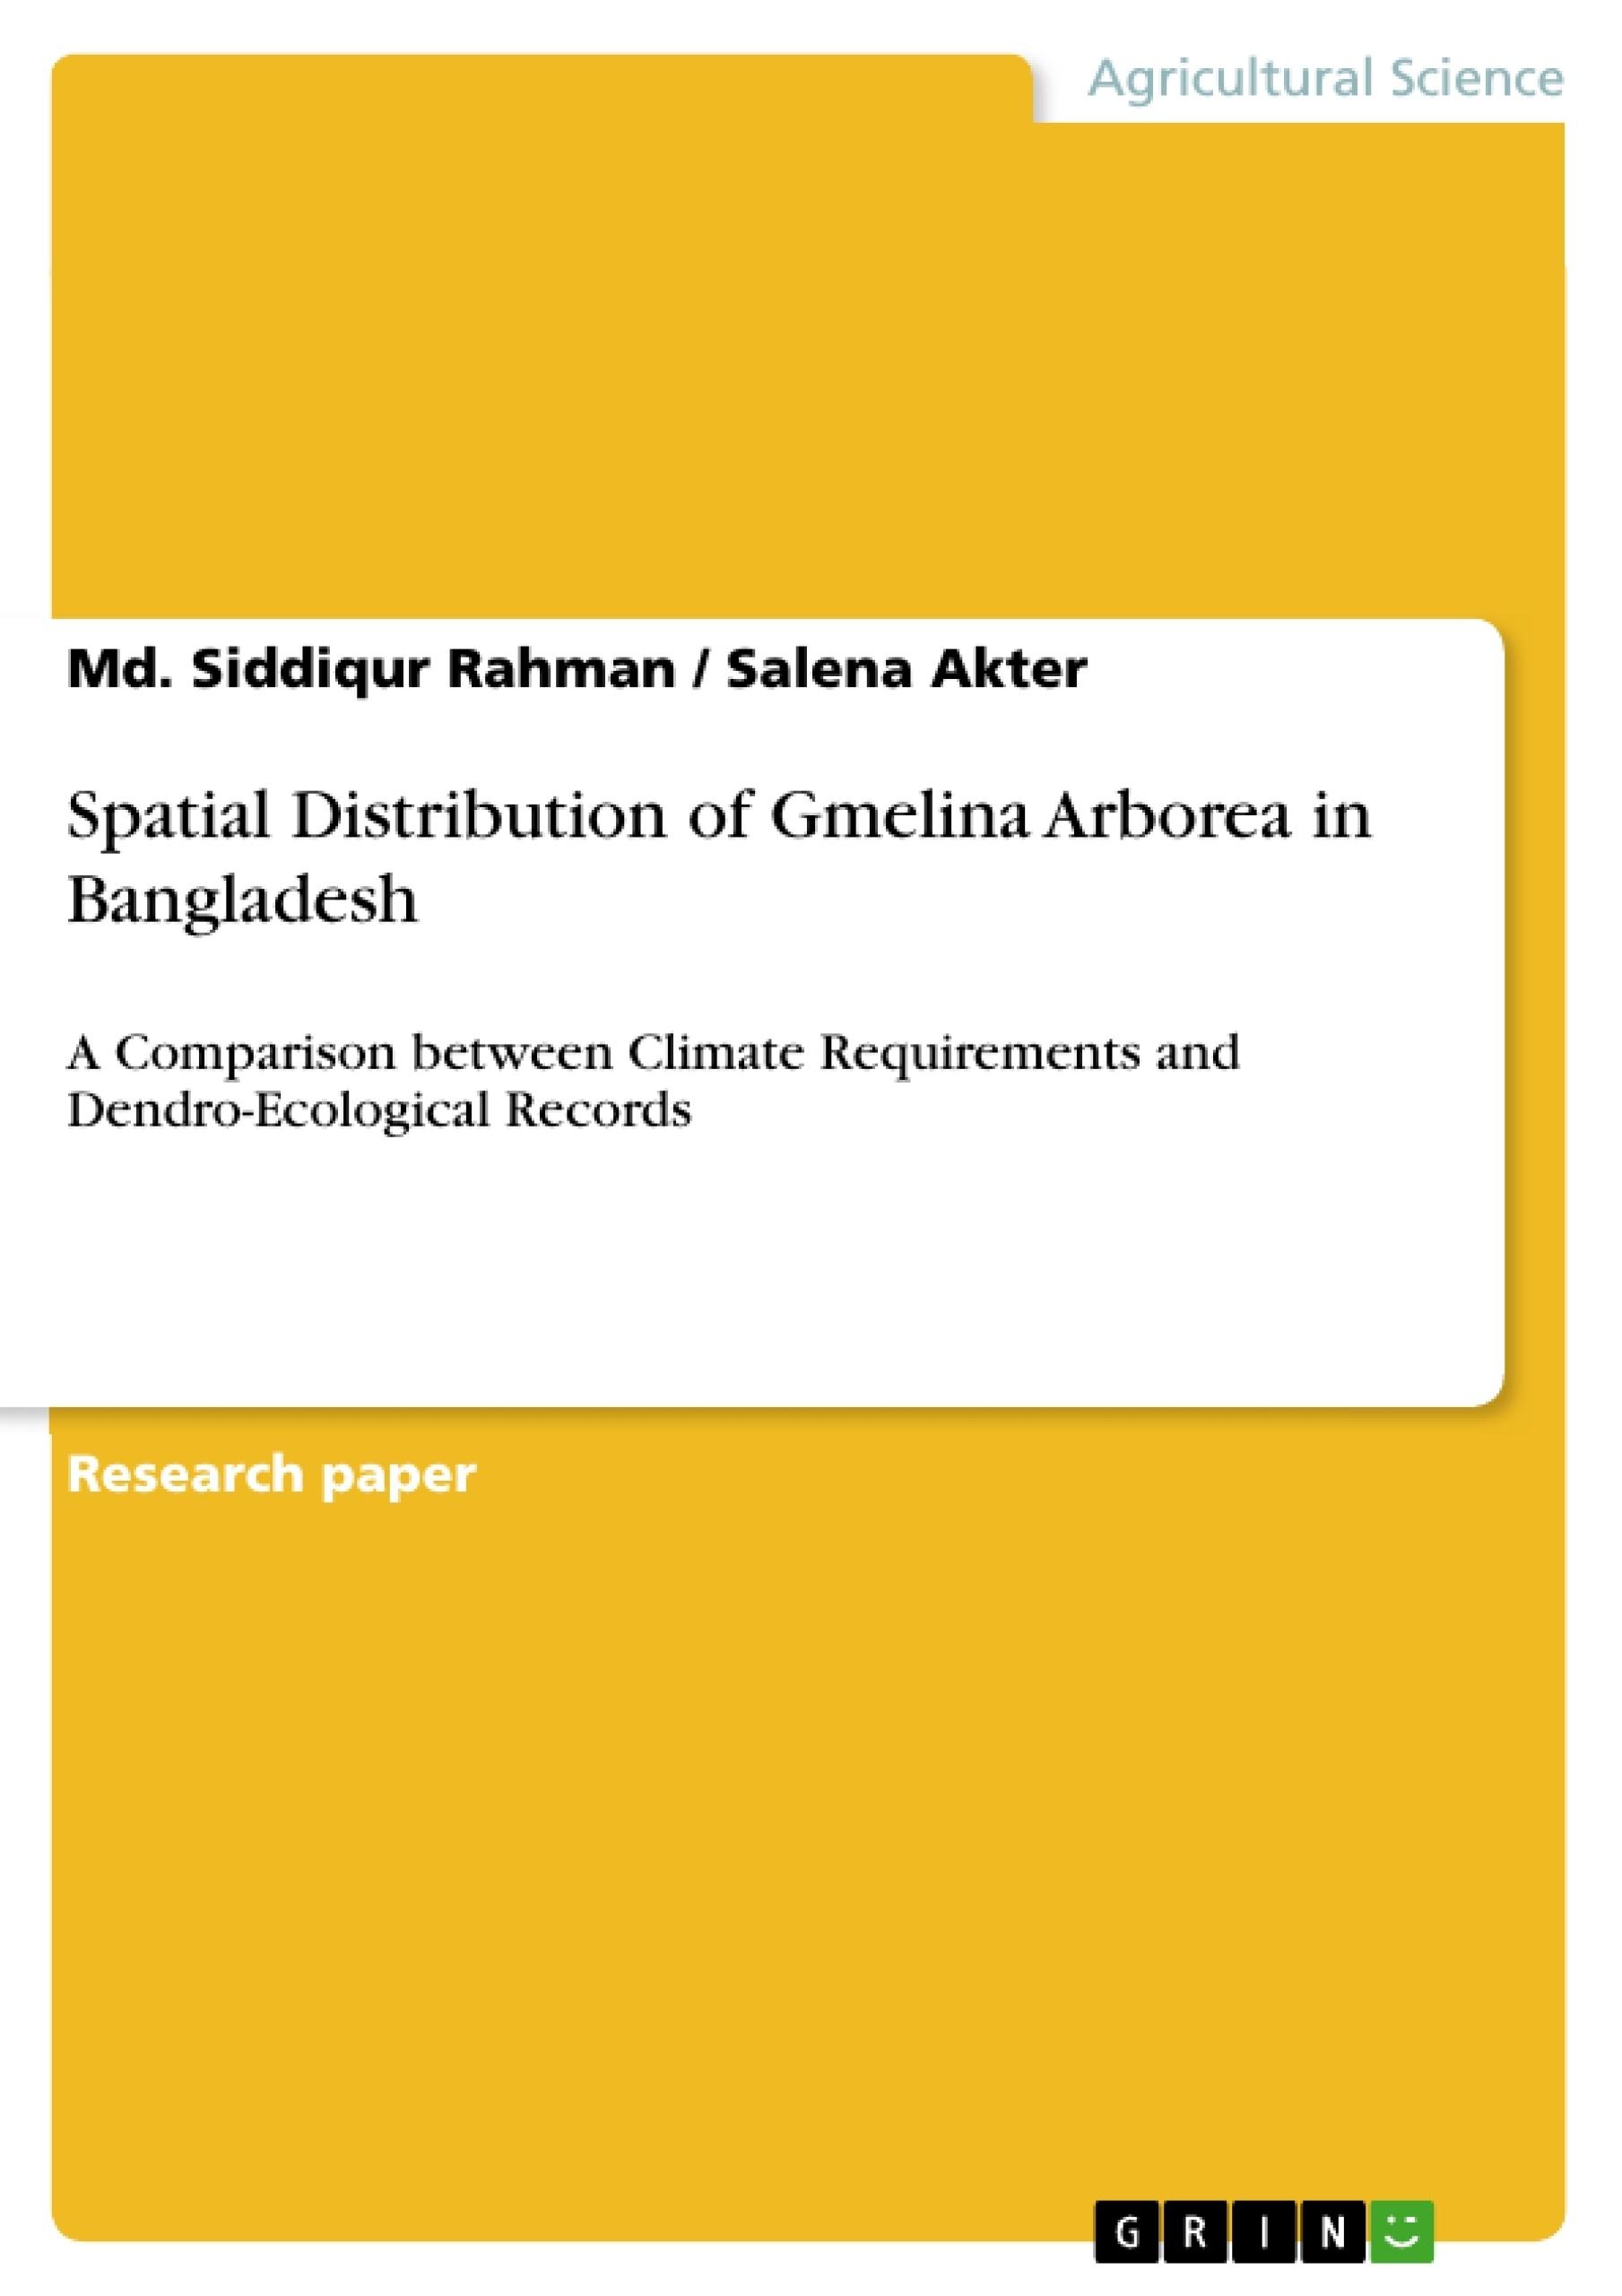 Title: Spatial Distribution of Gmelina Arborea in Bangladesh